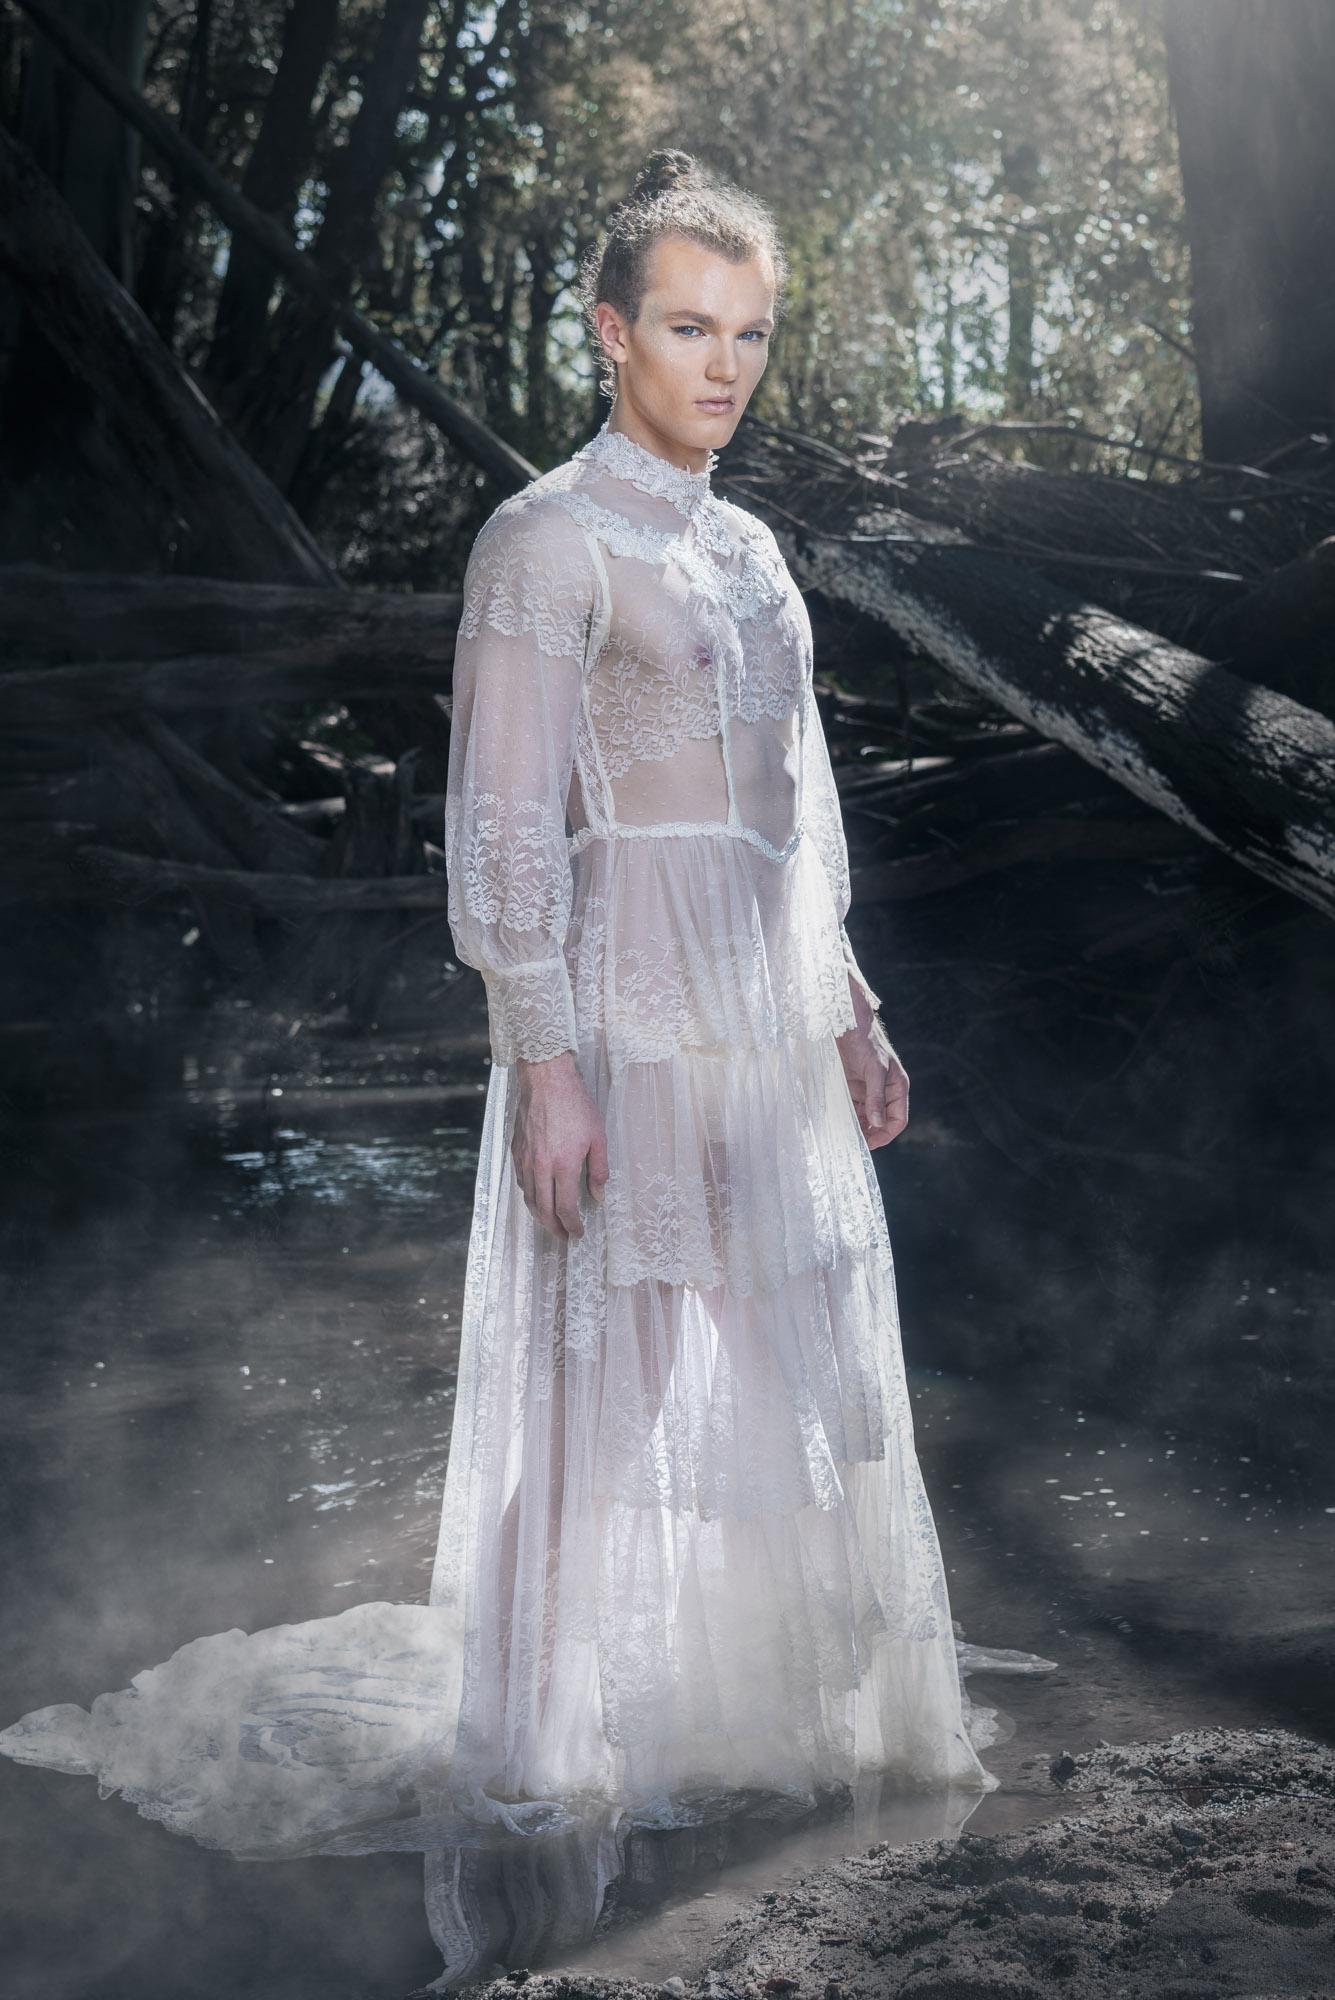 Crystal Kore